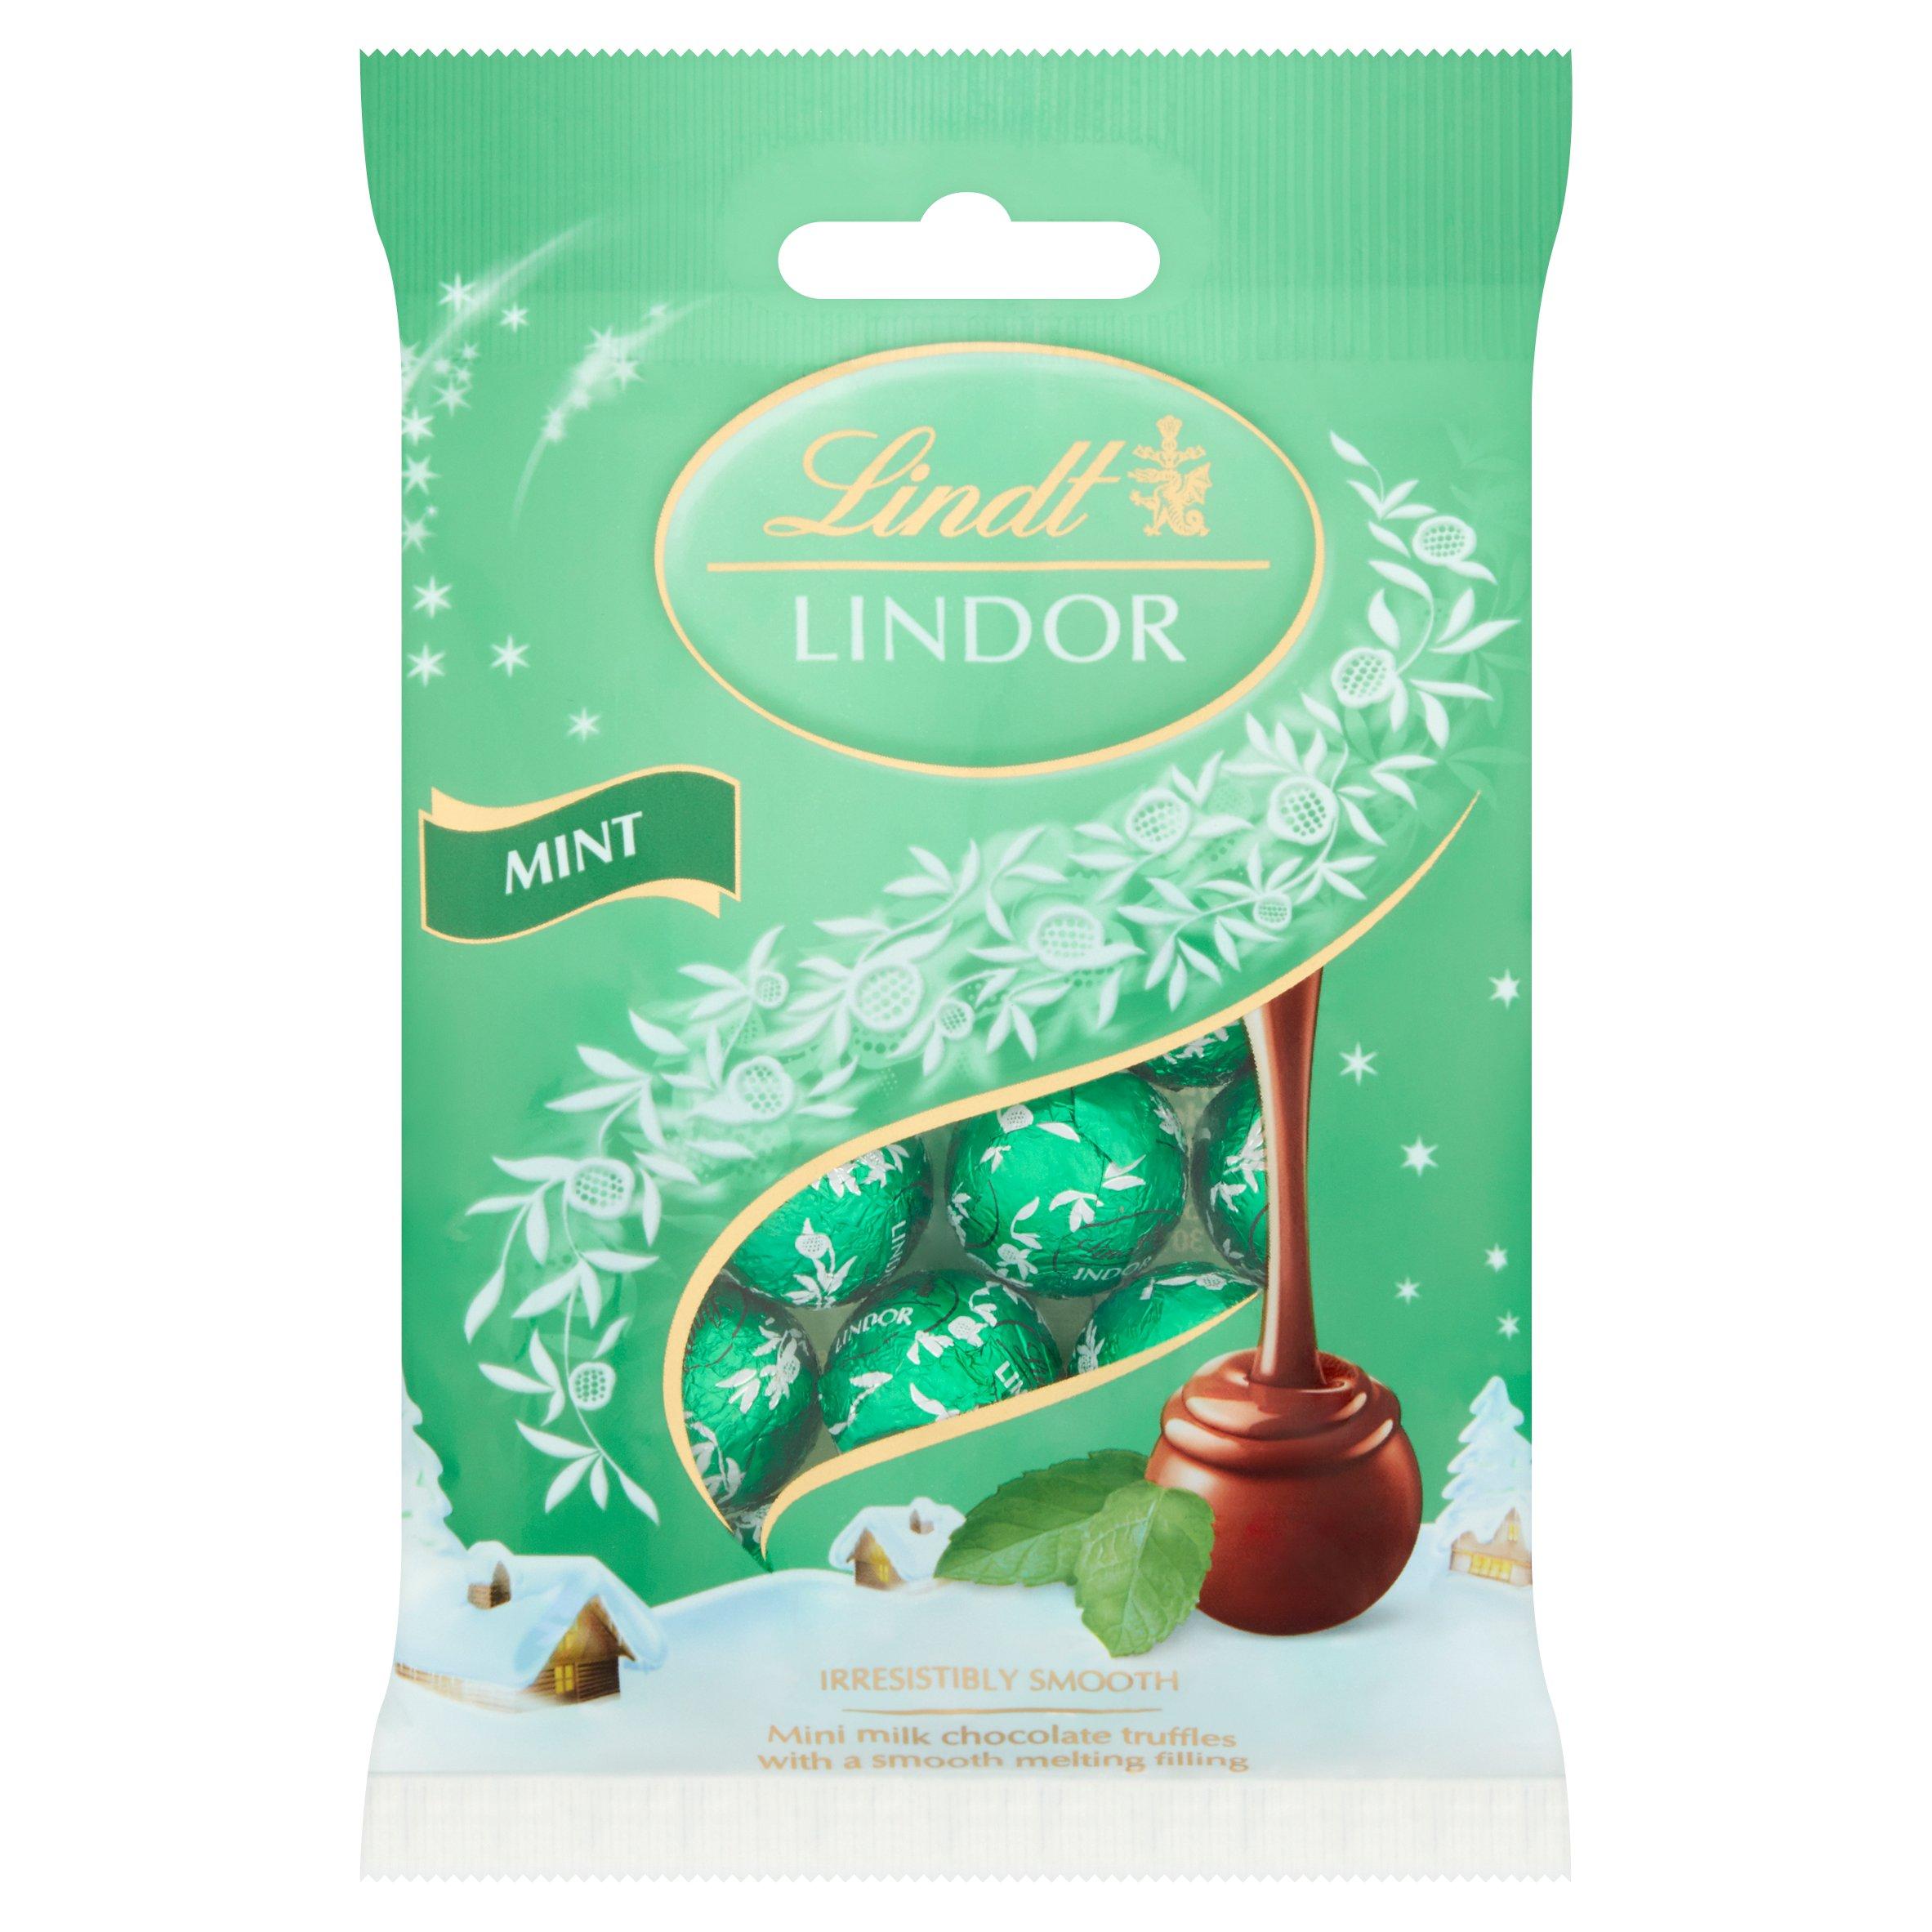 Lindt Lindor Mint Mini Milk Chocolate Truffles 80G